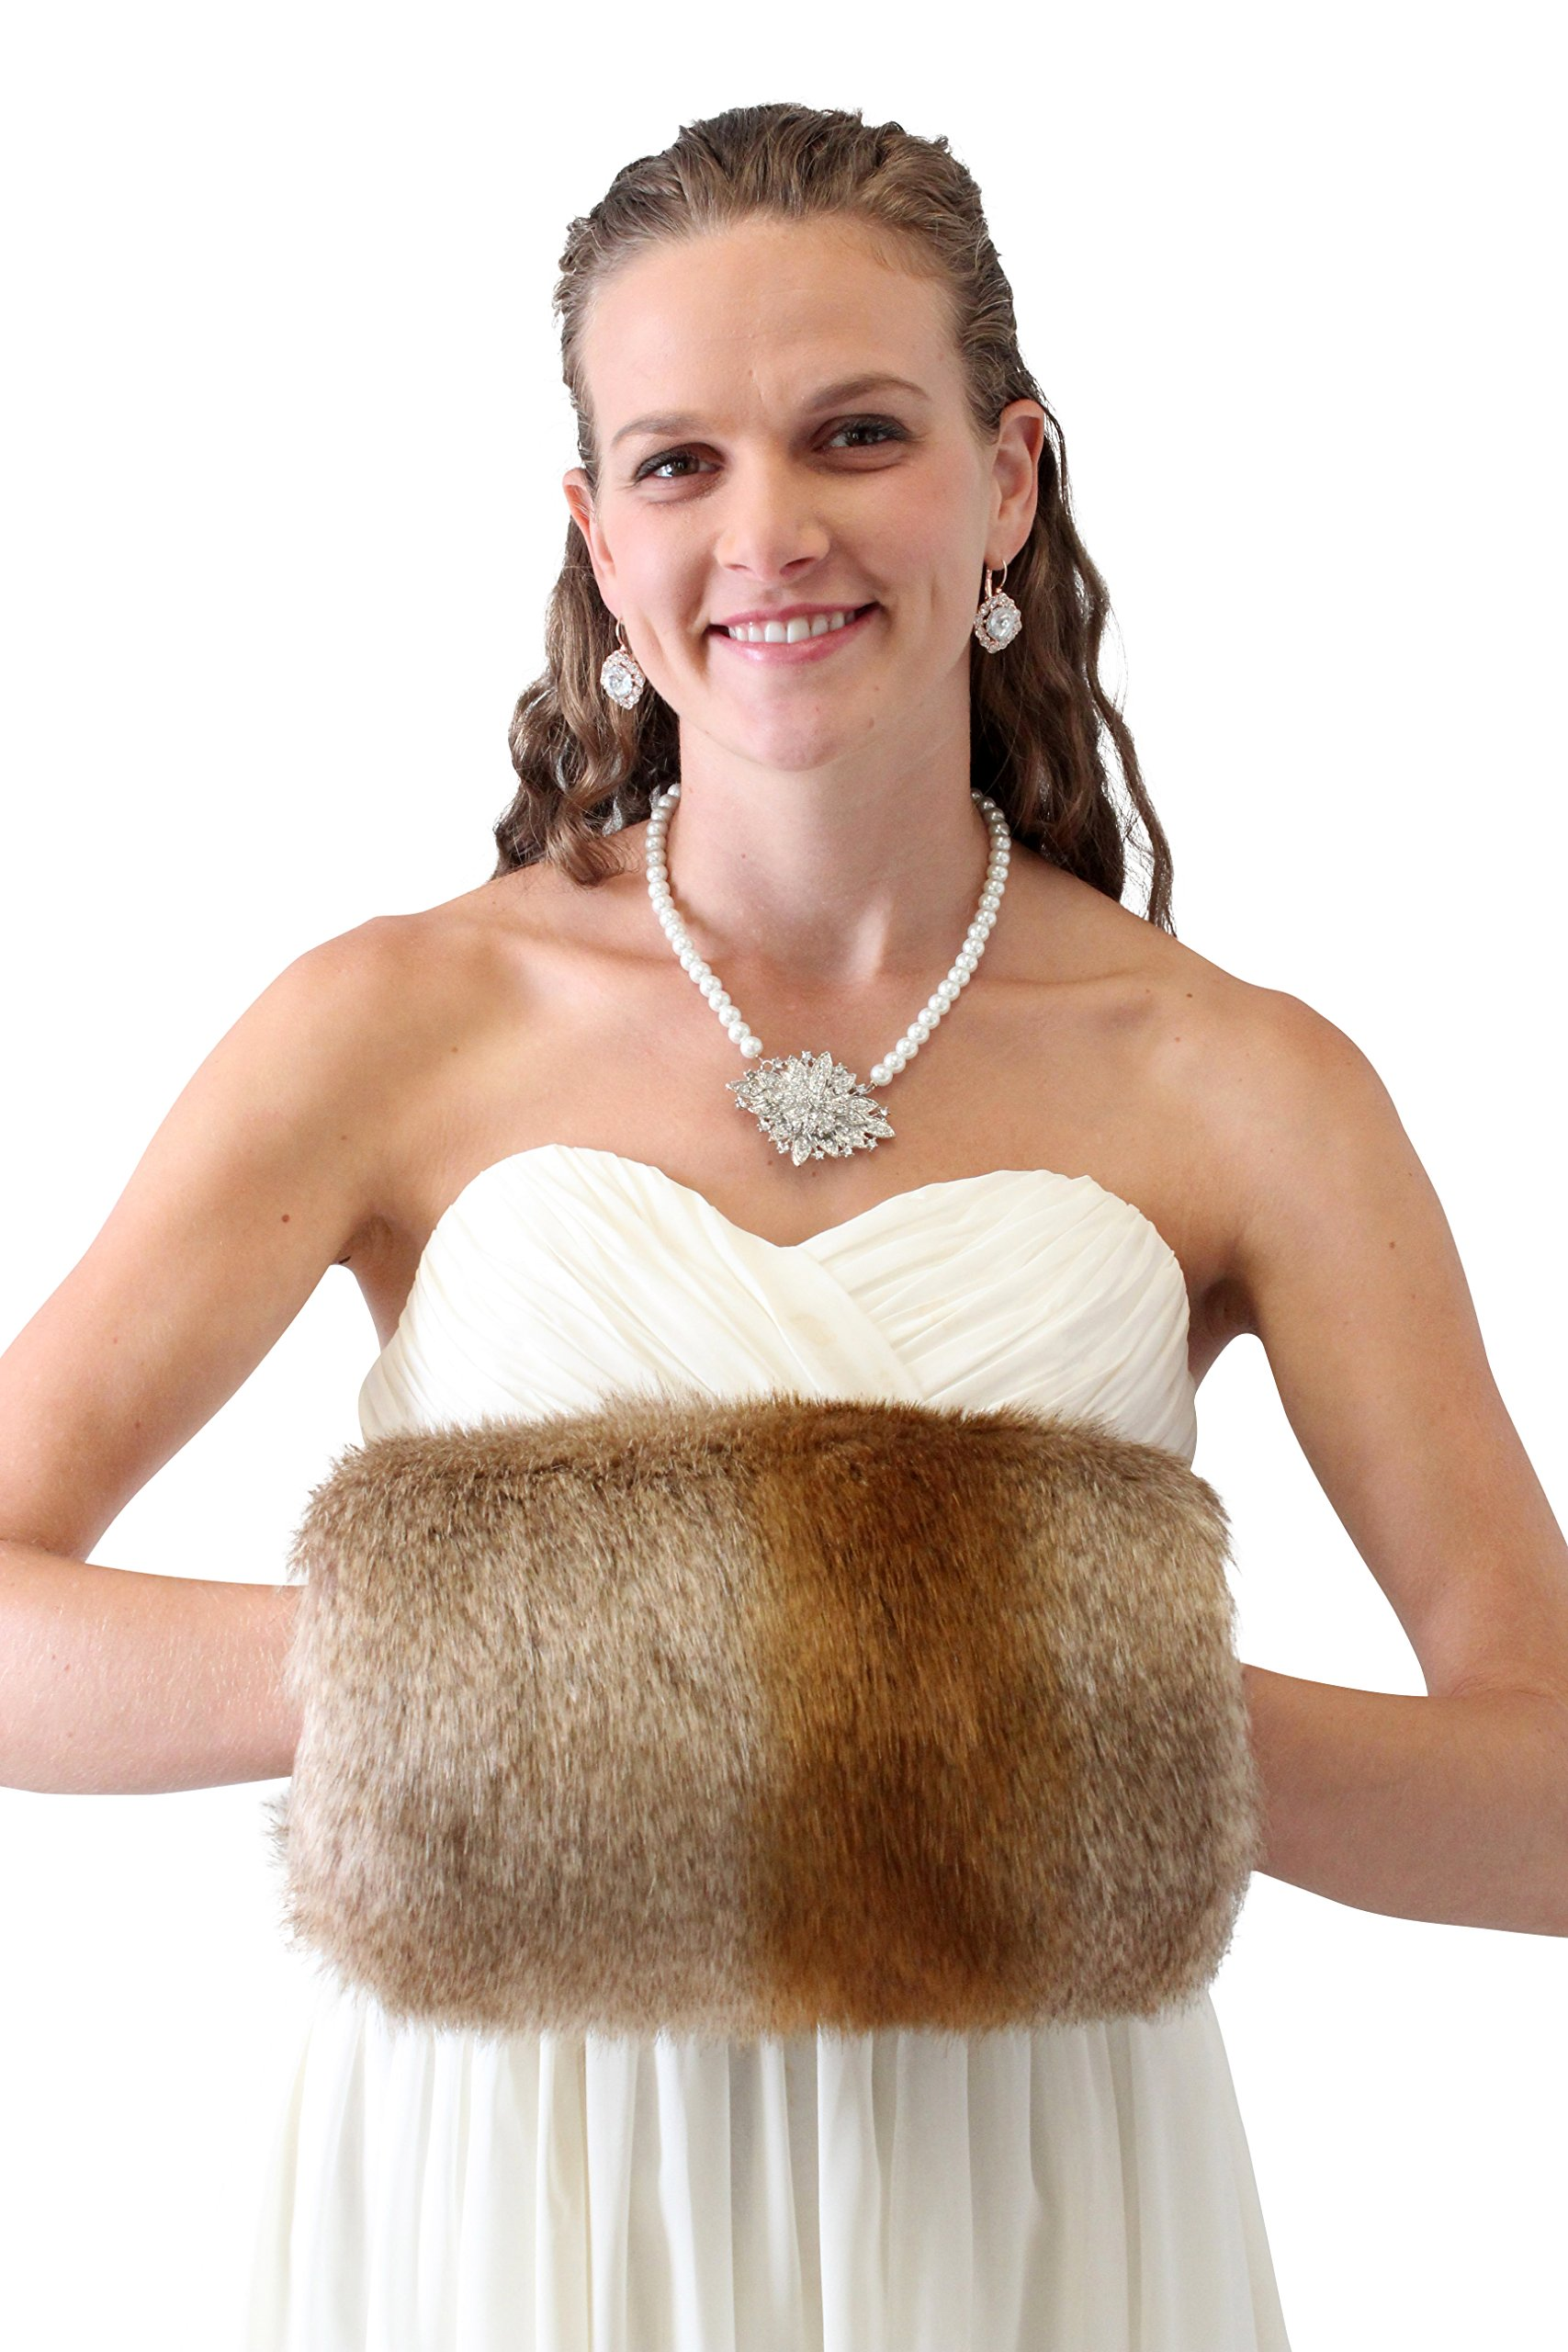 Tion Design Bridal Fur Muff, Vintage Brown Faux Fur Hand Muff, Fur Warmer